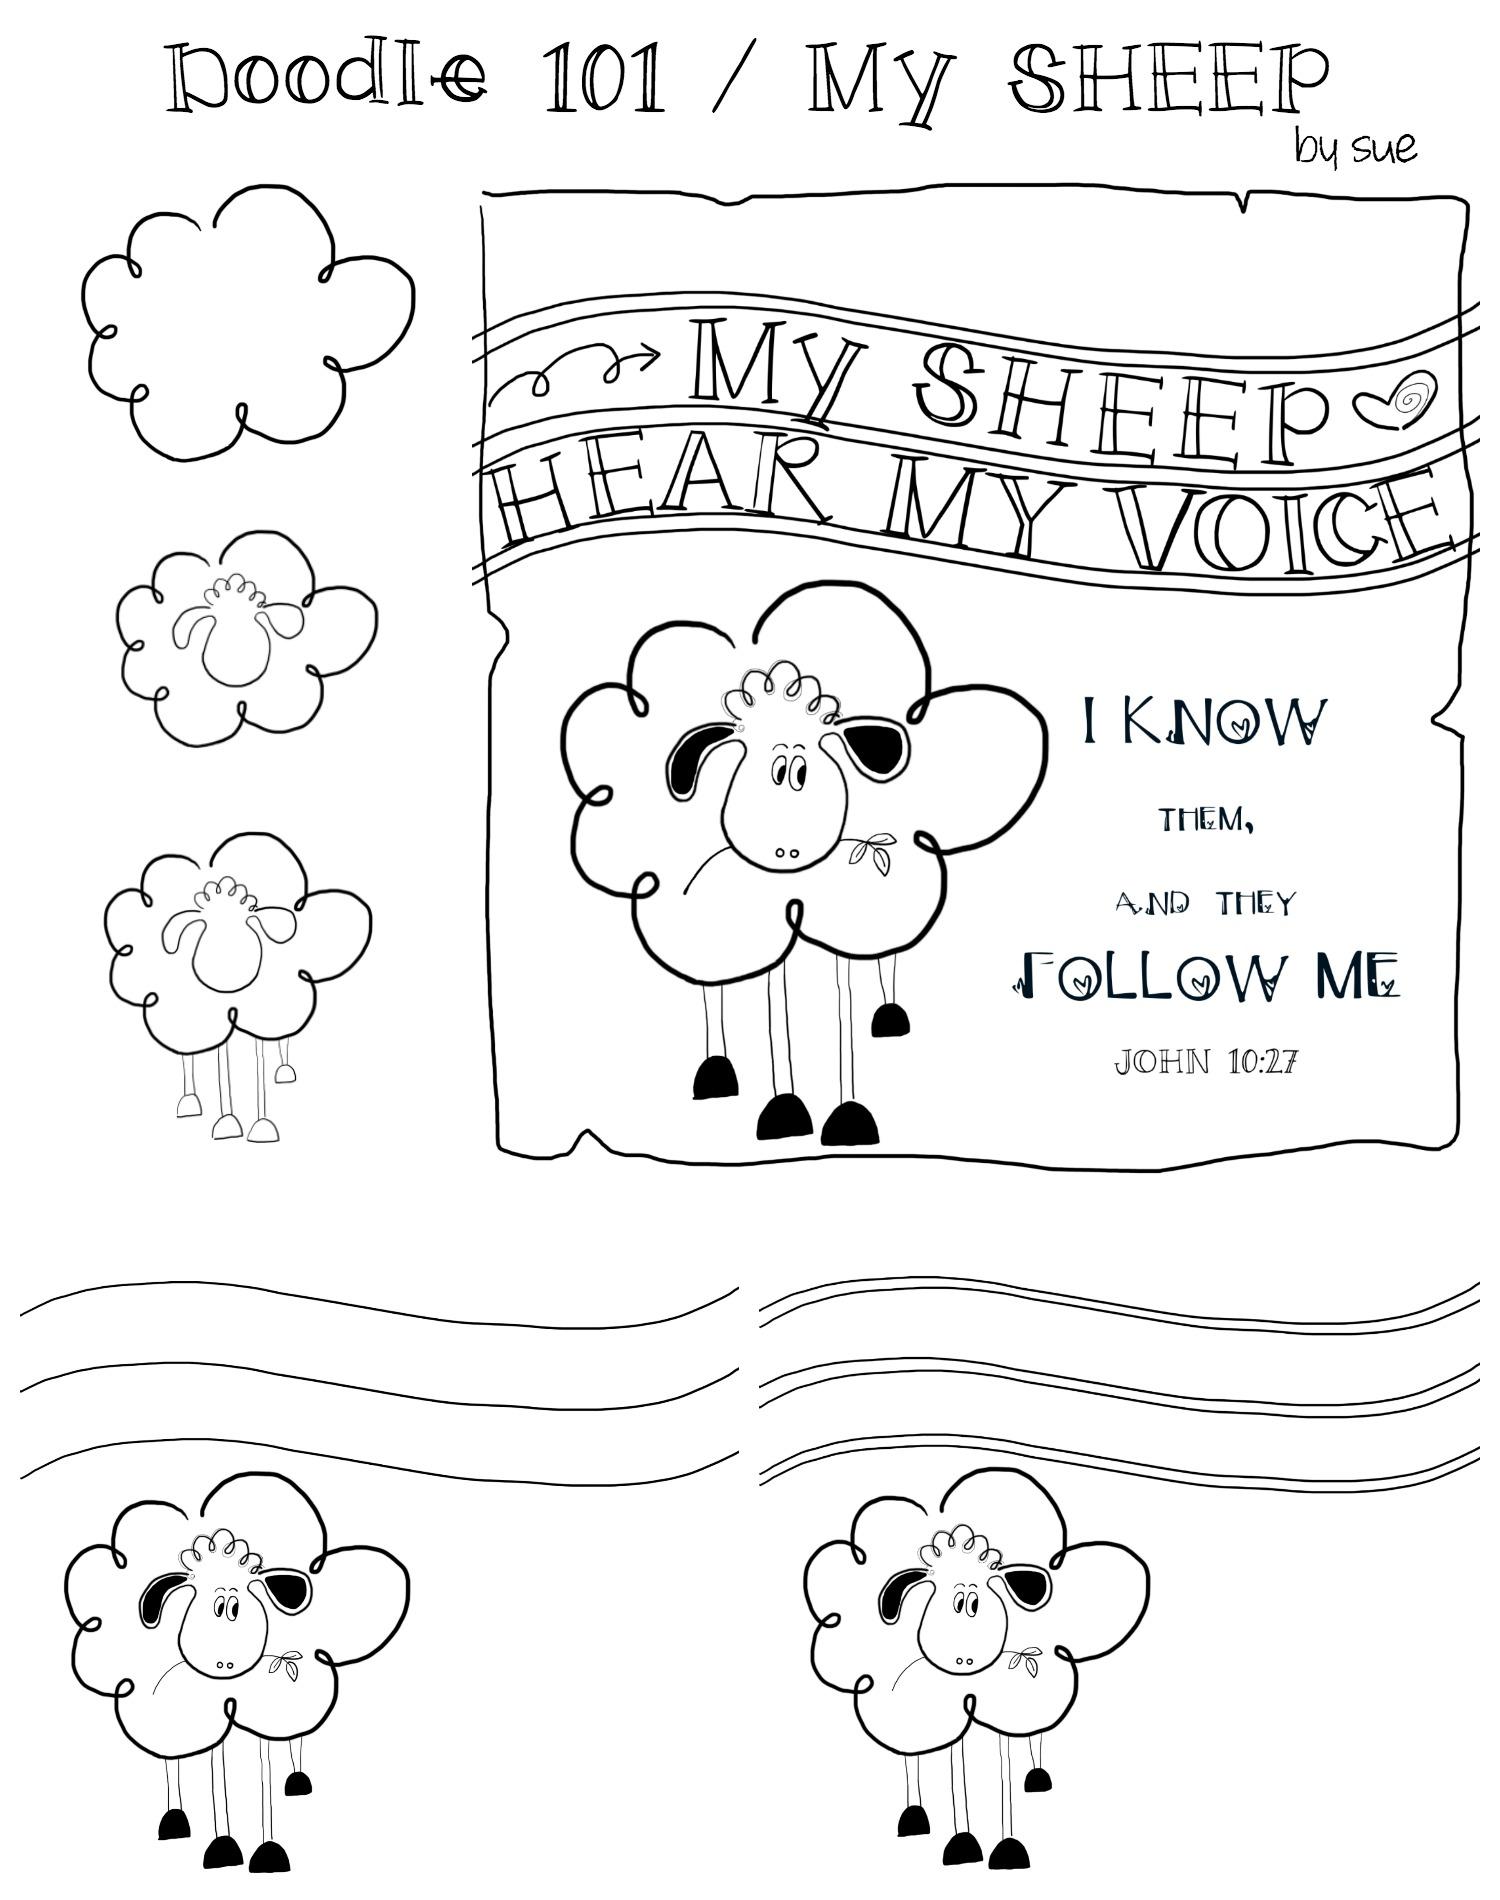 Doodle101:mysheep/SueCarroll